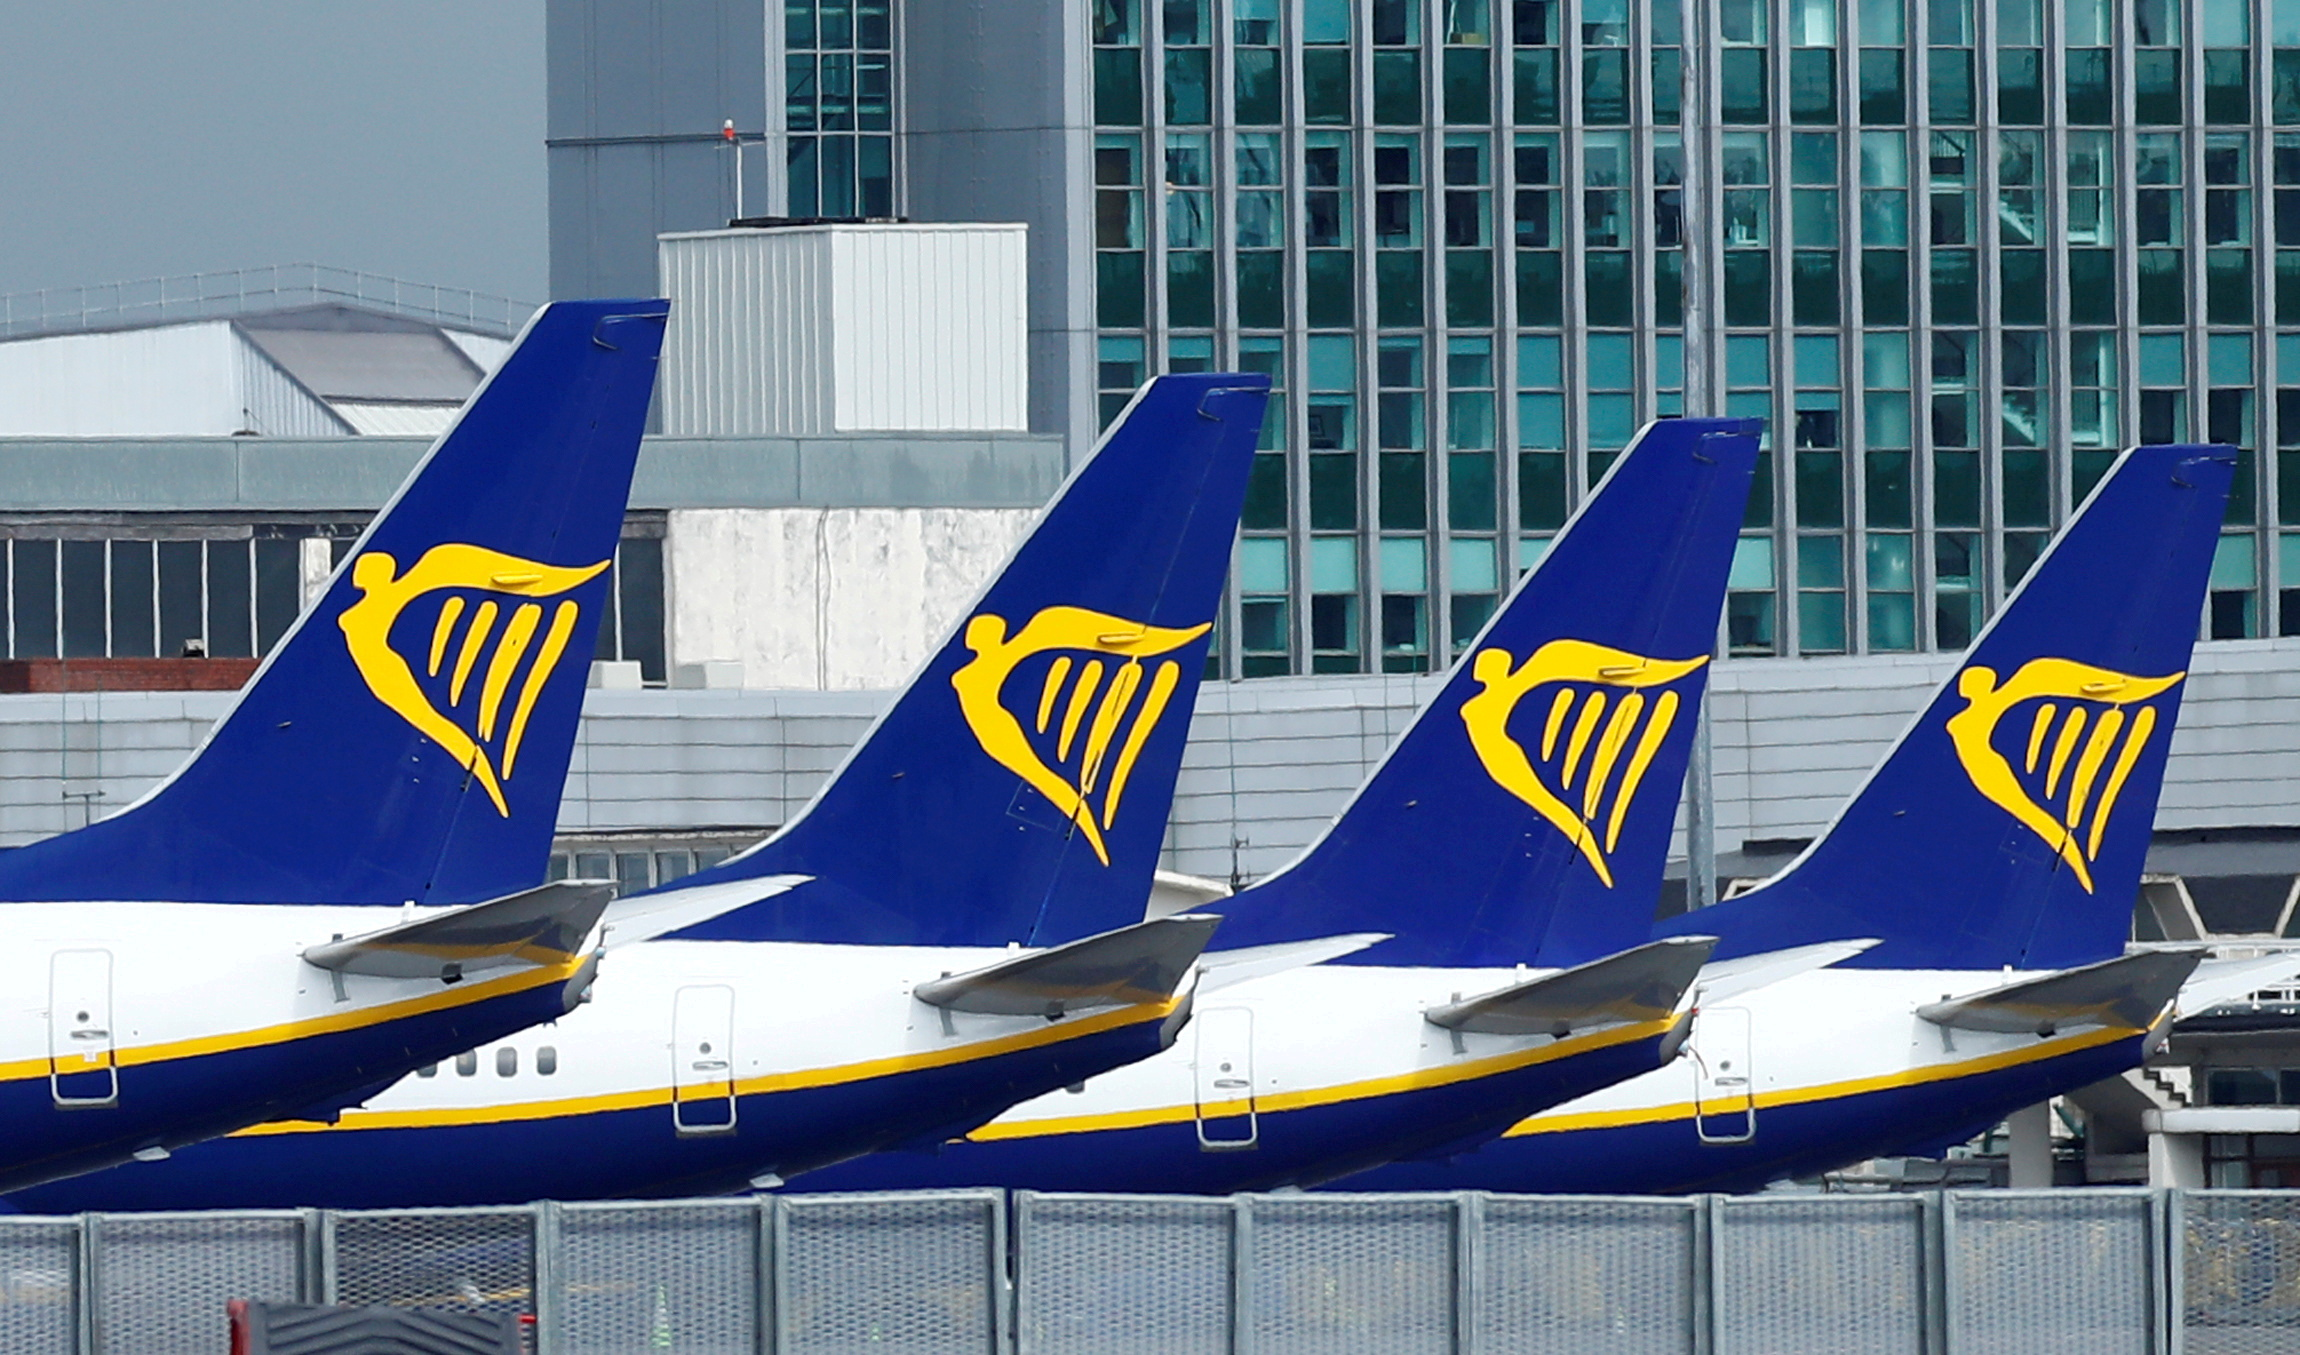 Ryanair planes are seen at Dublin Airport, following the outbreak of the coronavirus disease (COVID-19), Dublin, Ireland, May 1, 2020. REUTERS/Jason Cairnduff